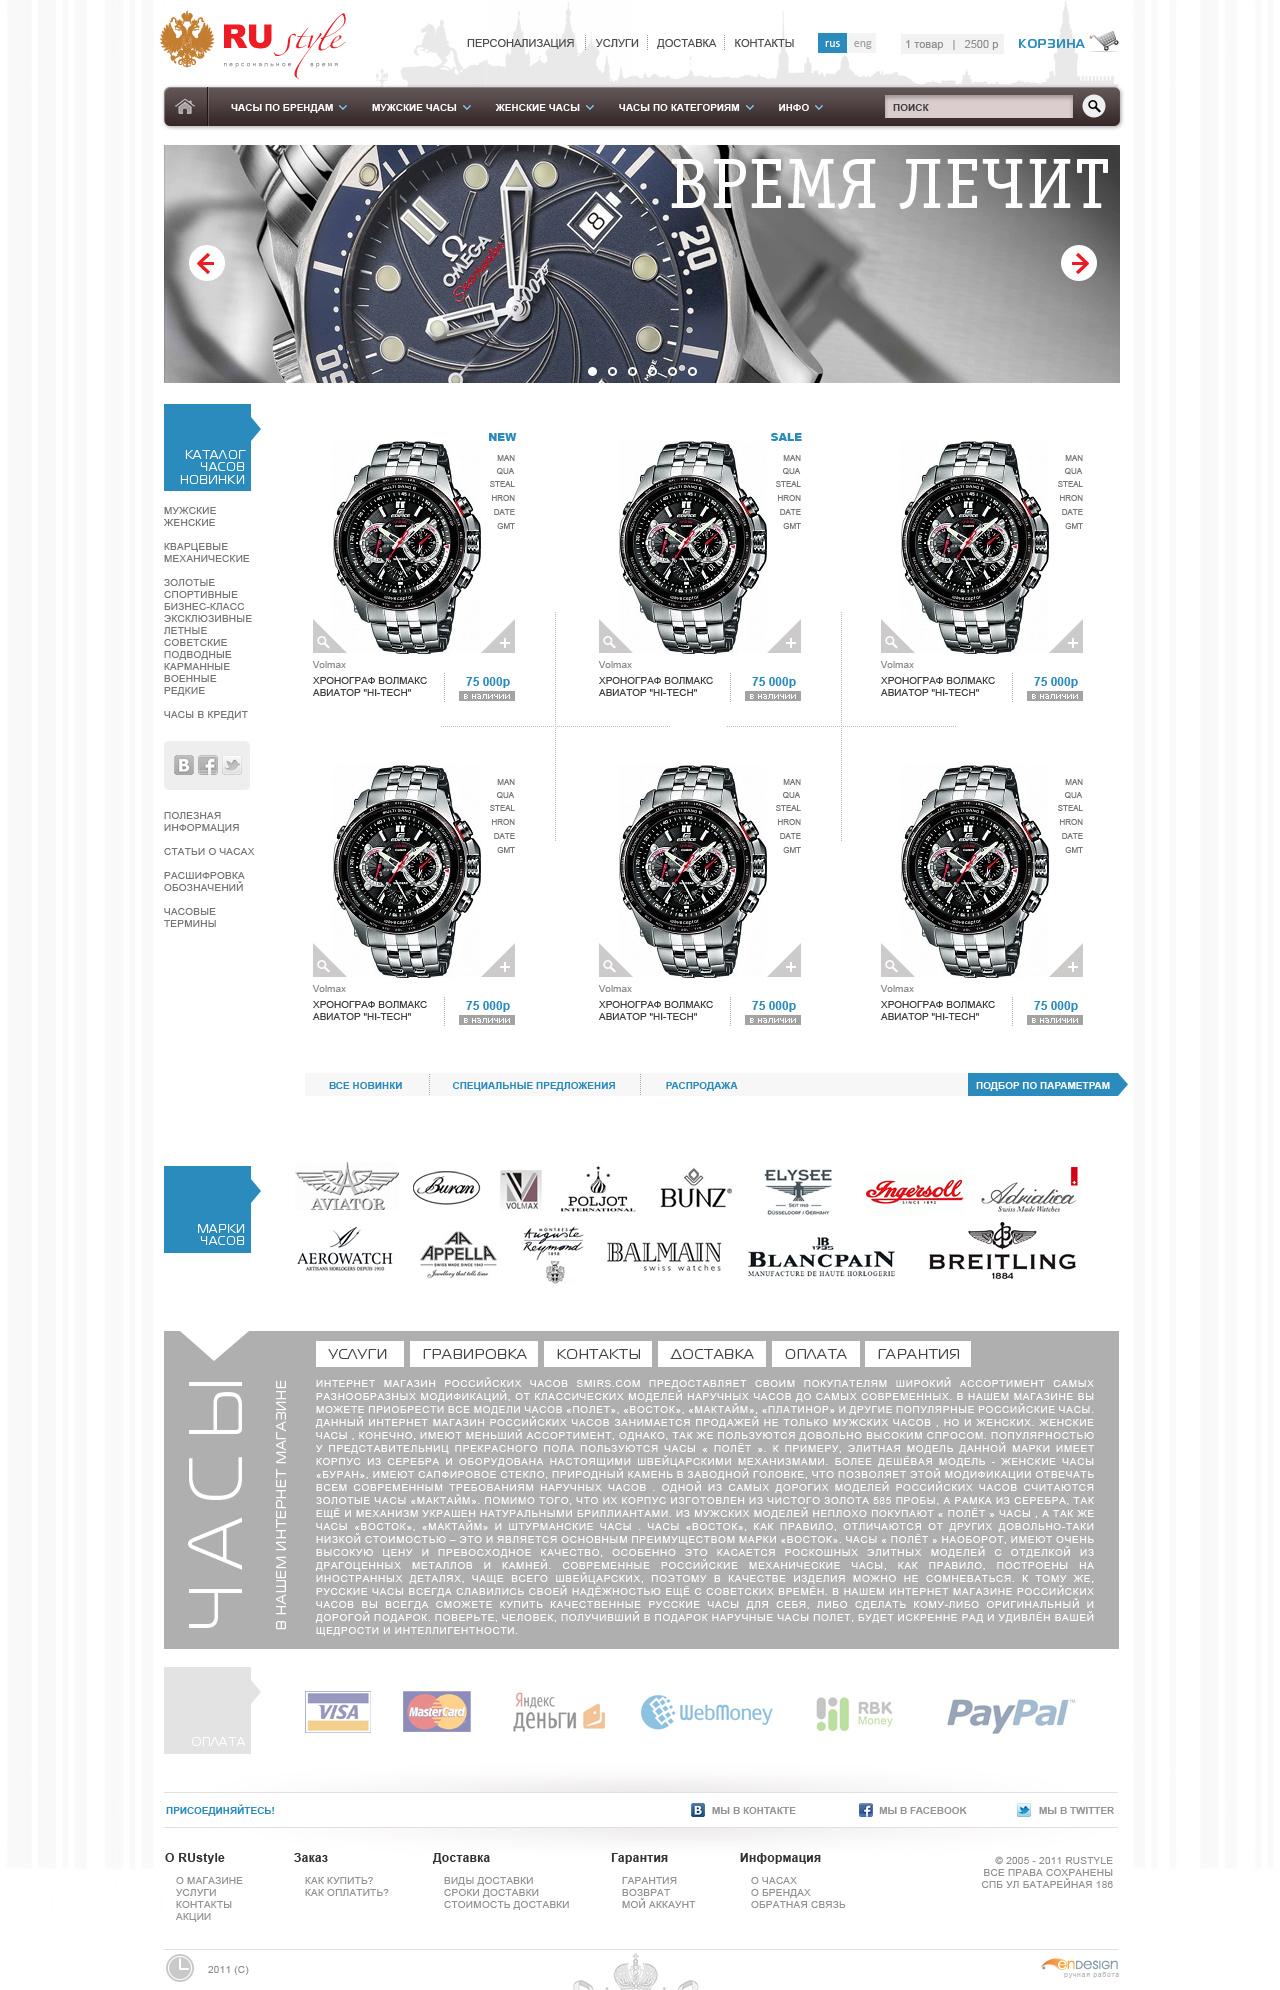 Интернет-магазин часов Ru-style